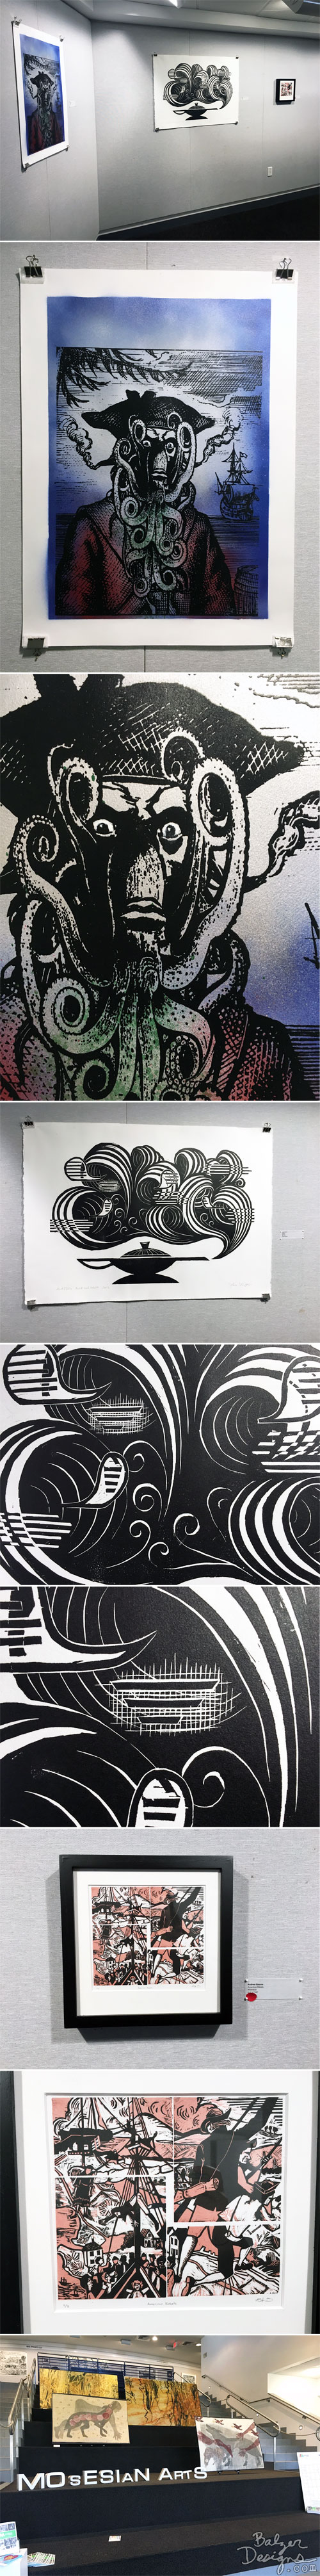 Print7-wm